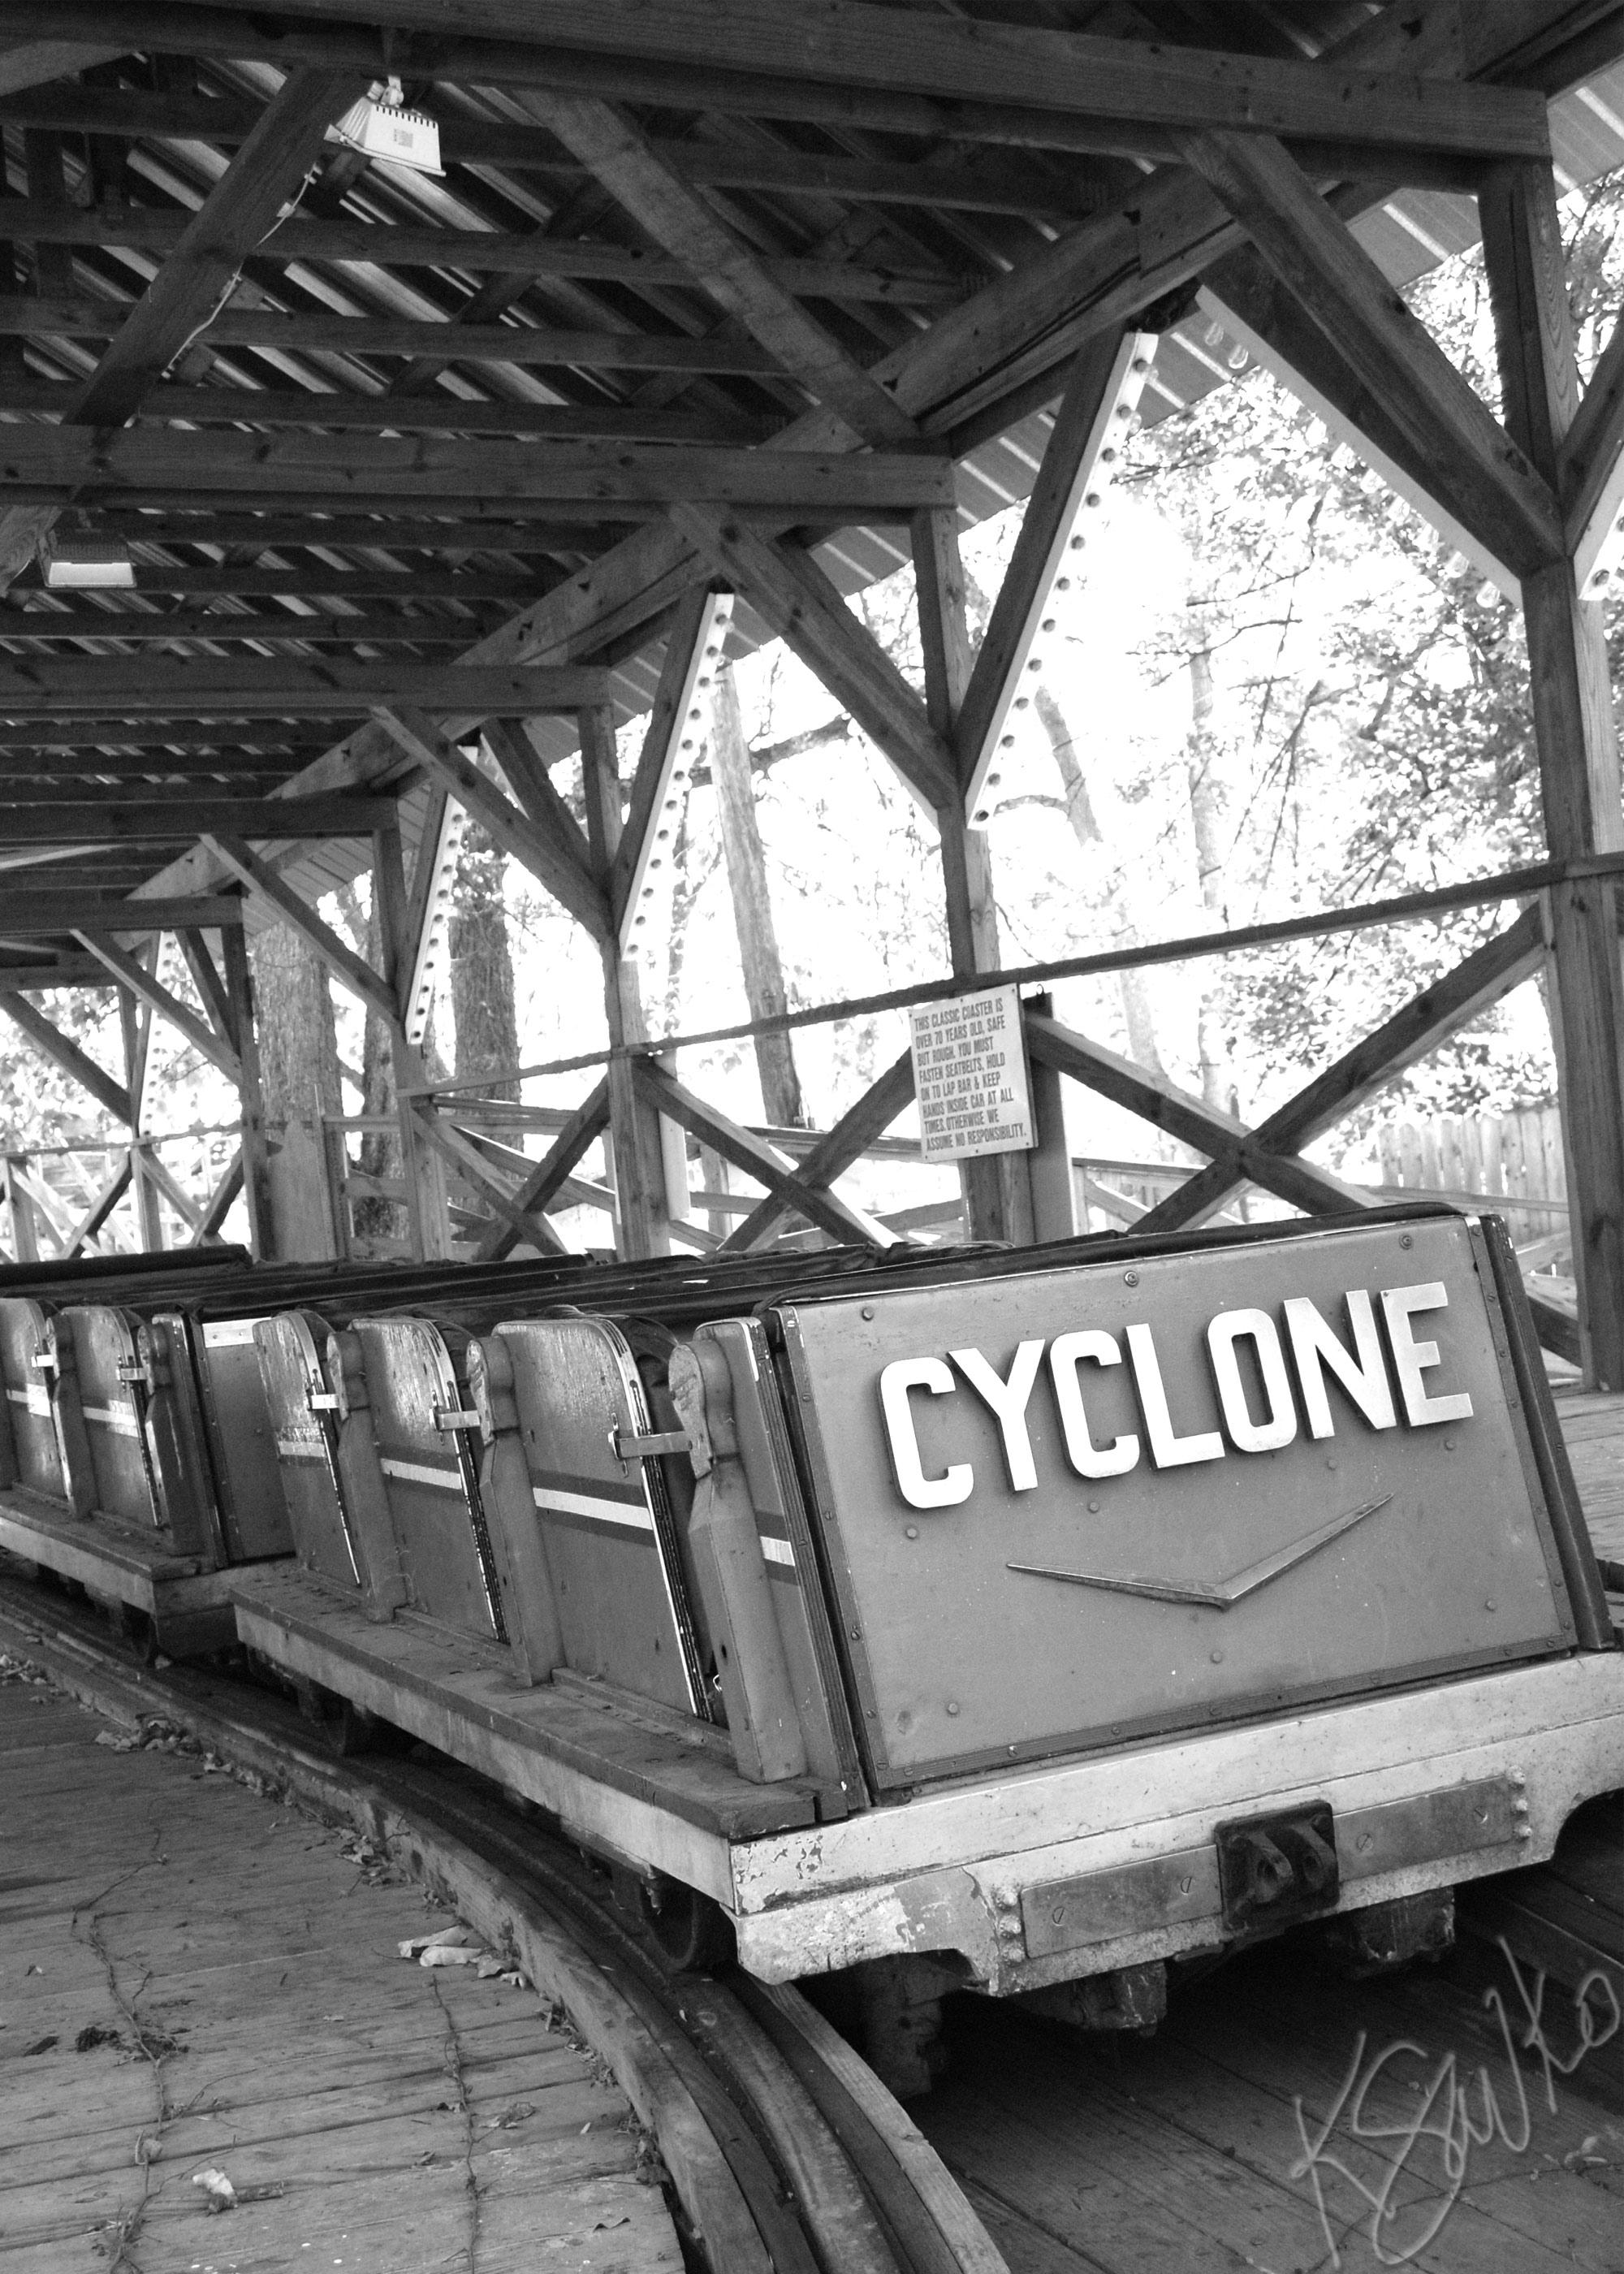 Cyclone at Williams Grove